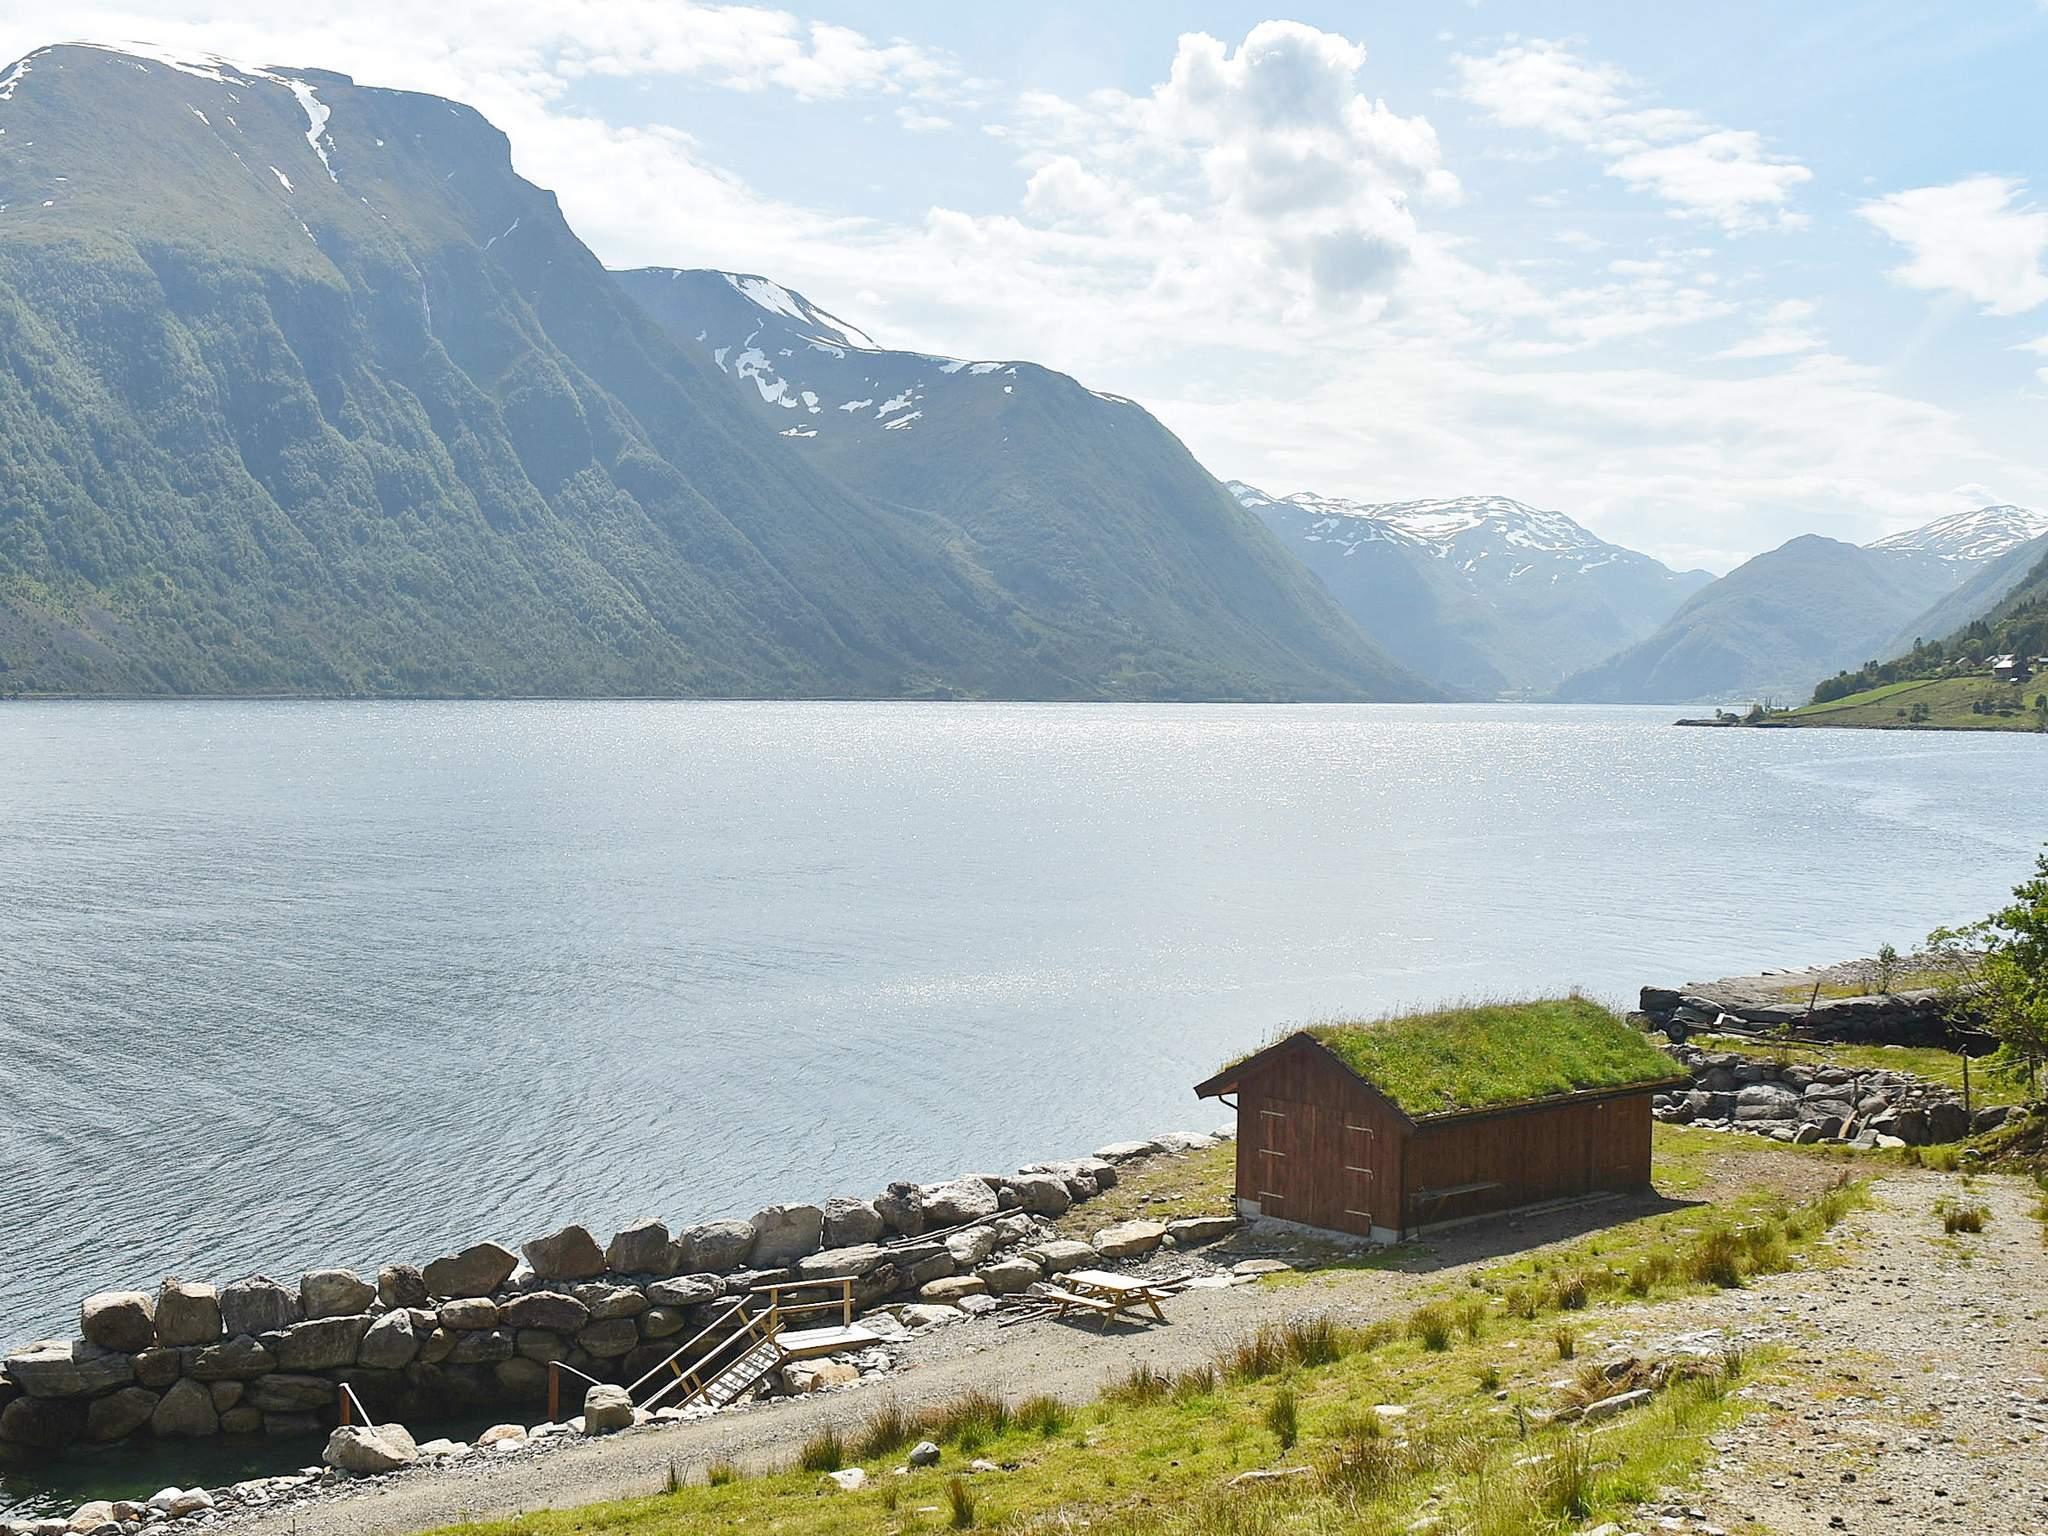 Ferienhaus Innselsetbygda (1043168), Lauvstad, More - Romsdal, Westnorwegen, Norwegen, Bild 53